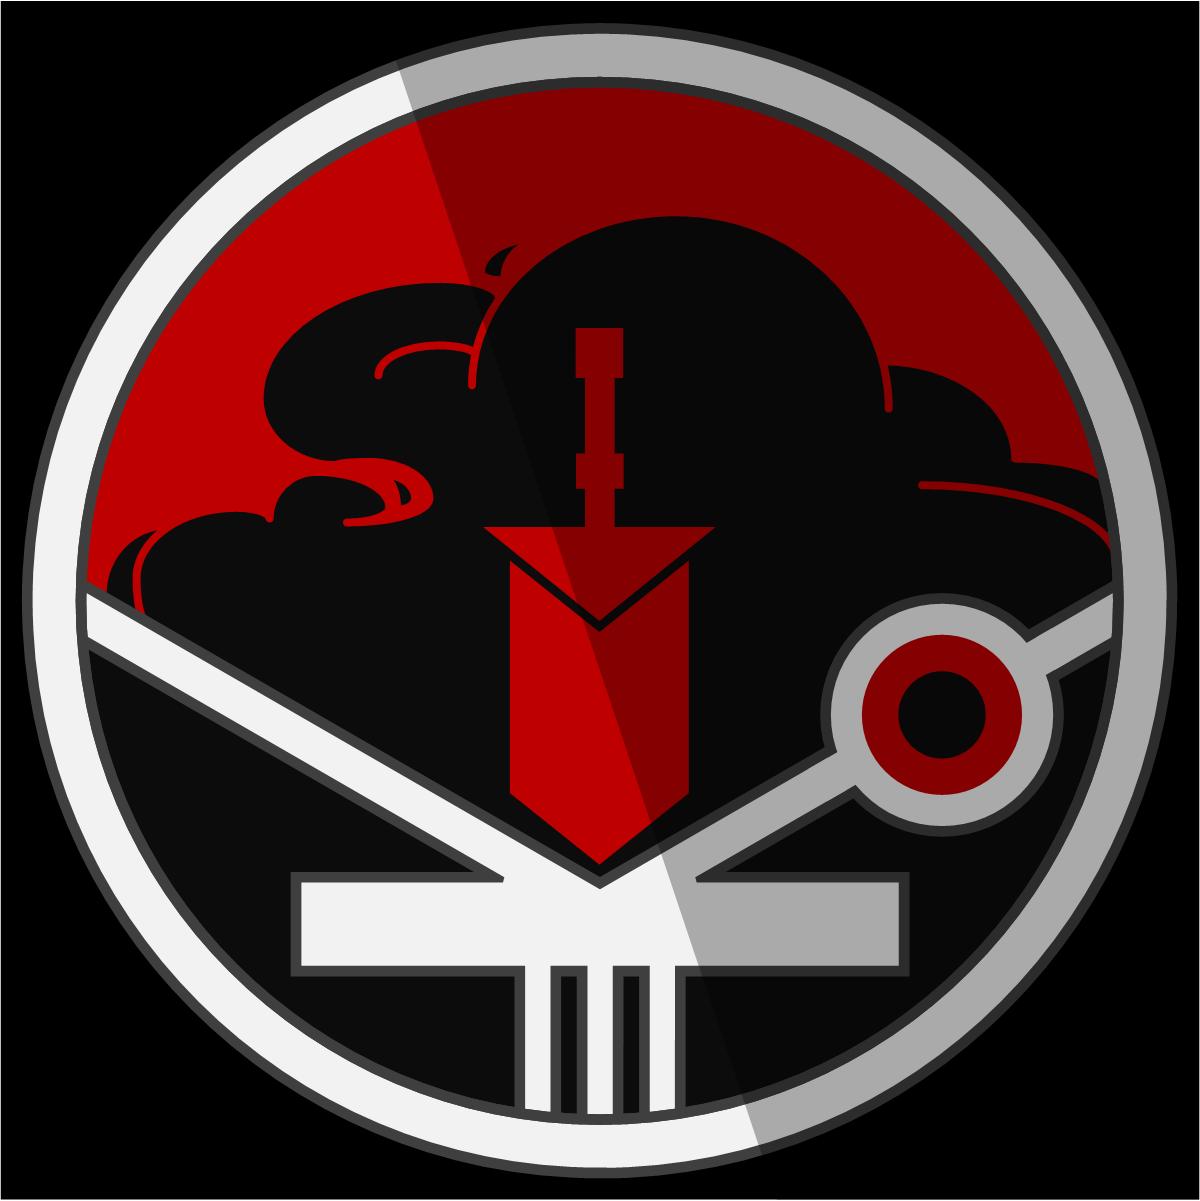 2014_06_24_camerata_emblem_by_valorcrow-d7nwb98